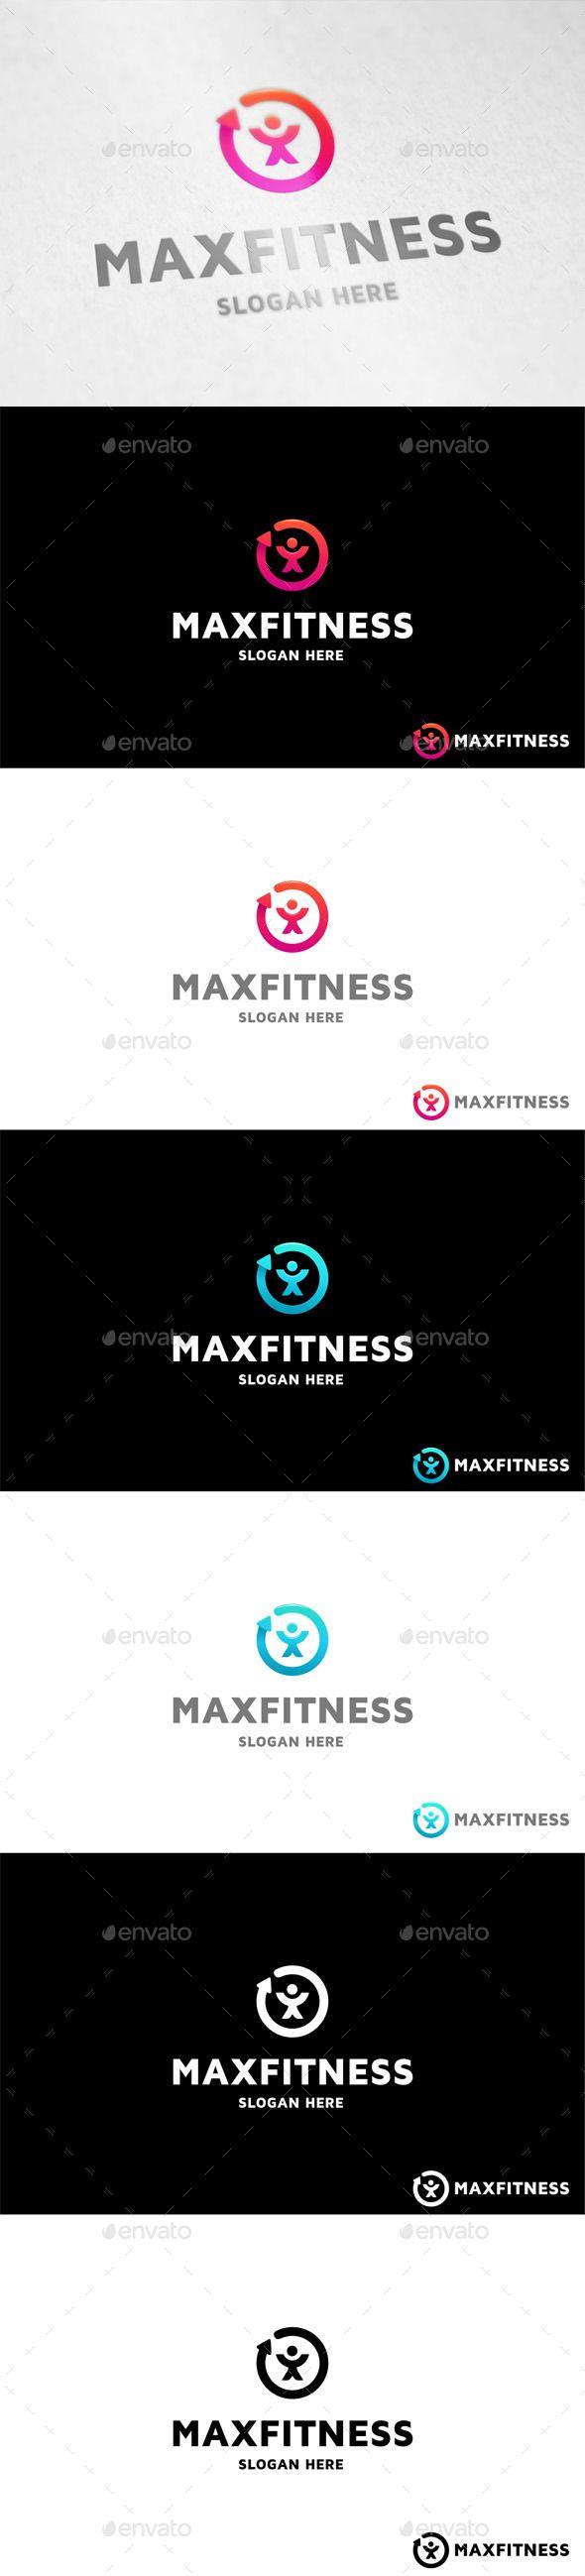 rigid industries logo vector. fitness logo \u2014 vector eps #fat #fitness \u2022 available here → https:/ rigid industries